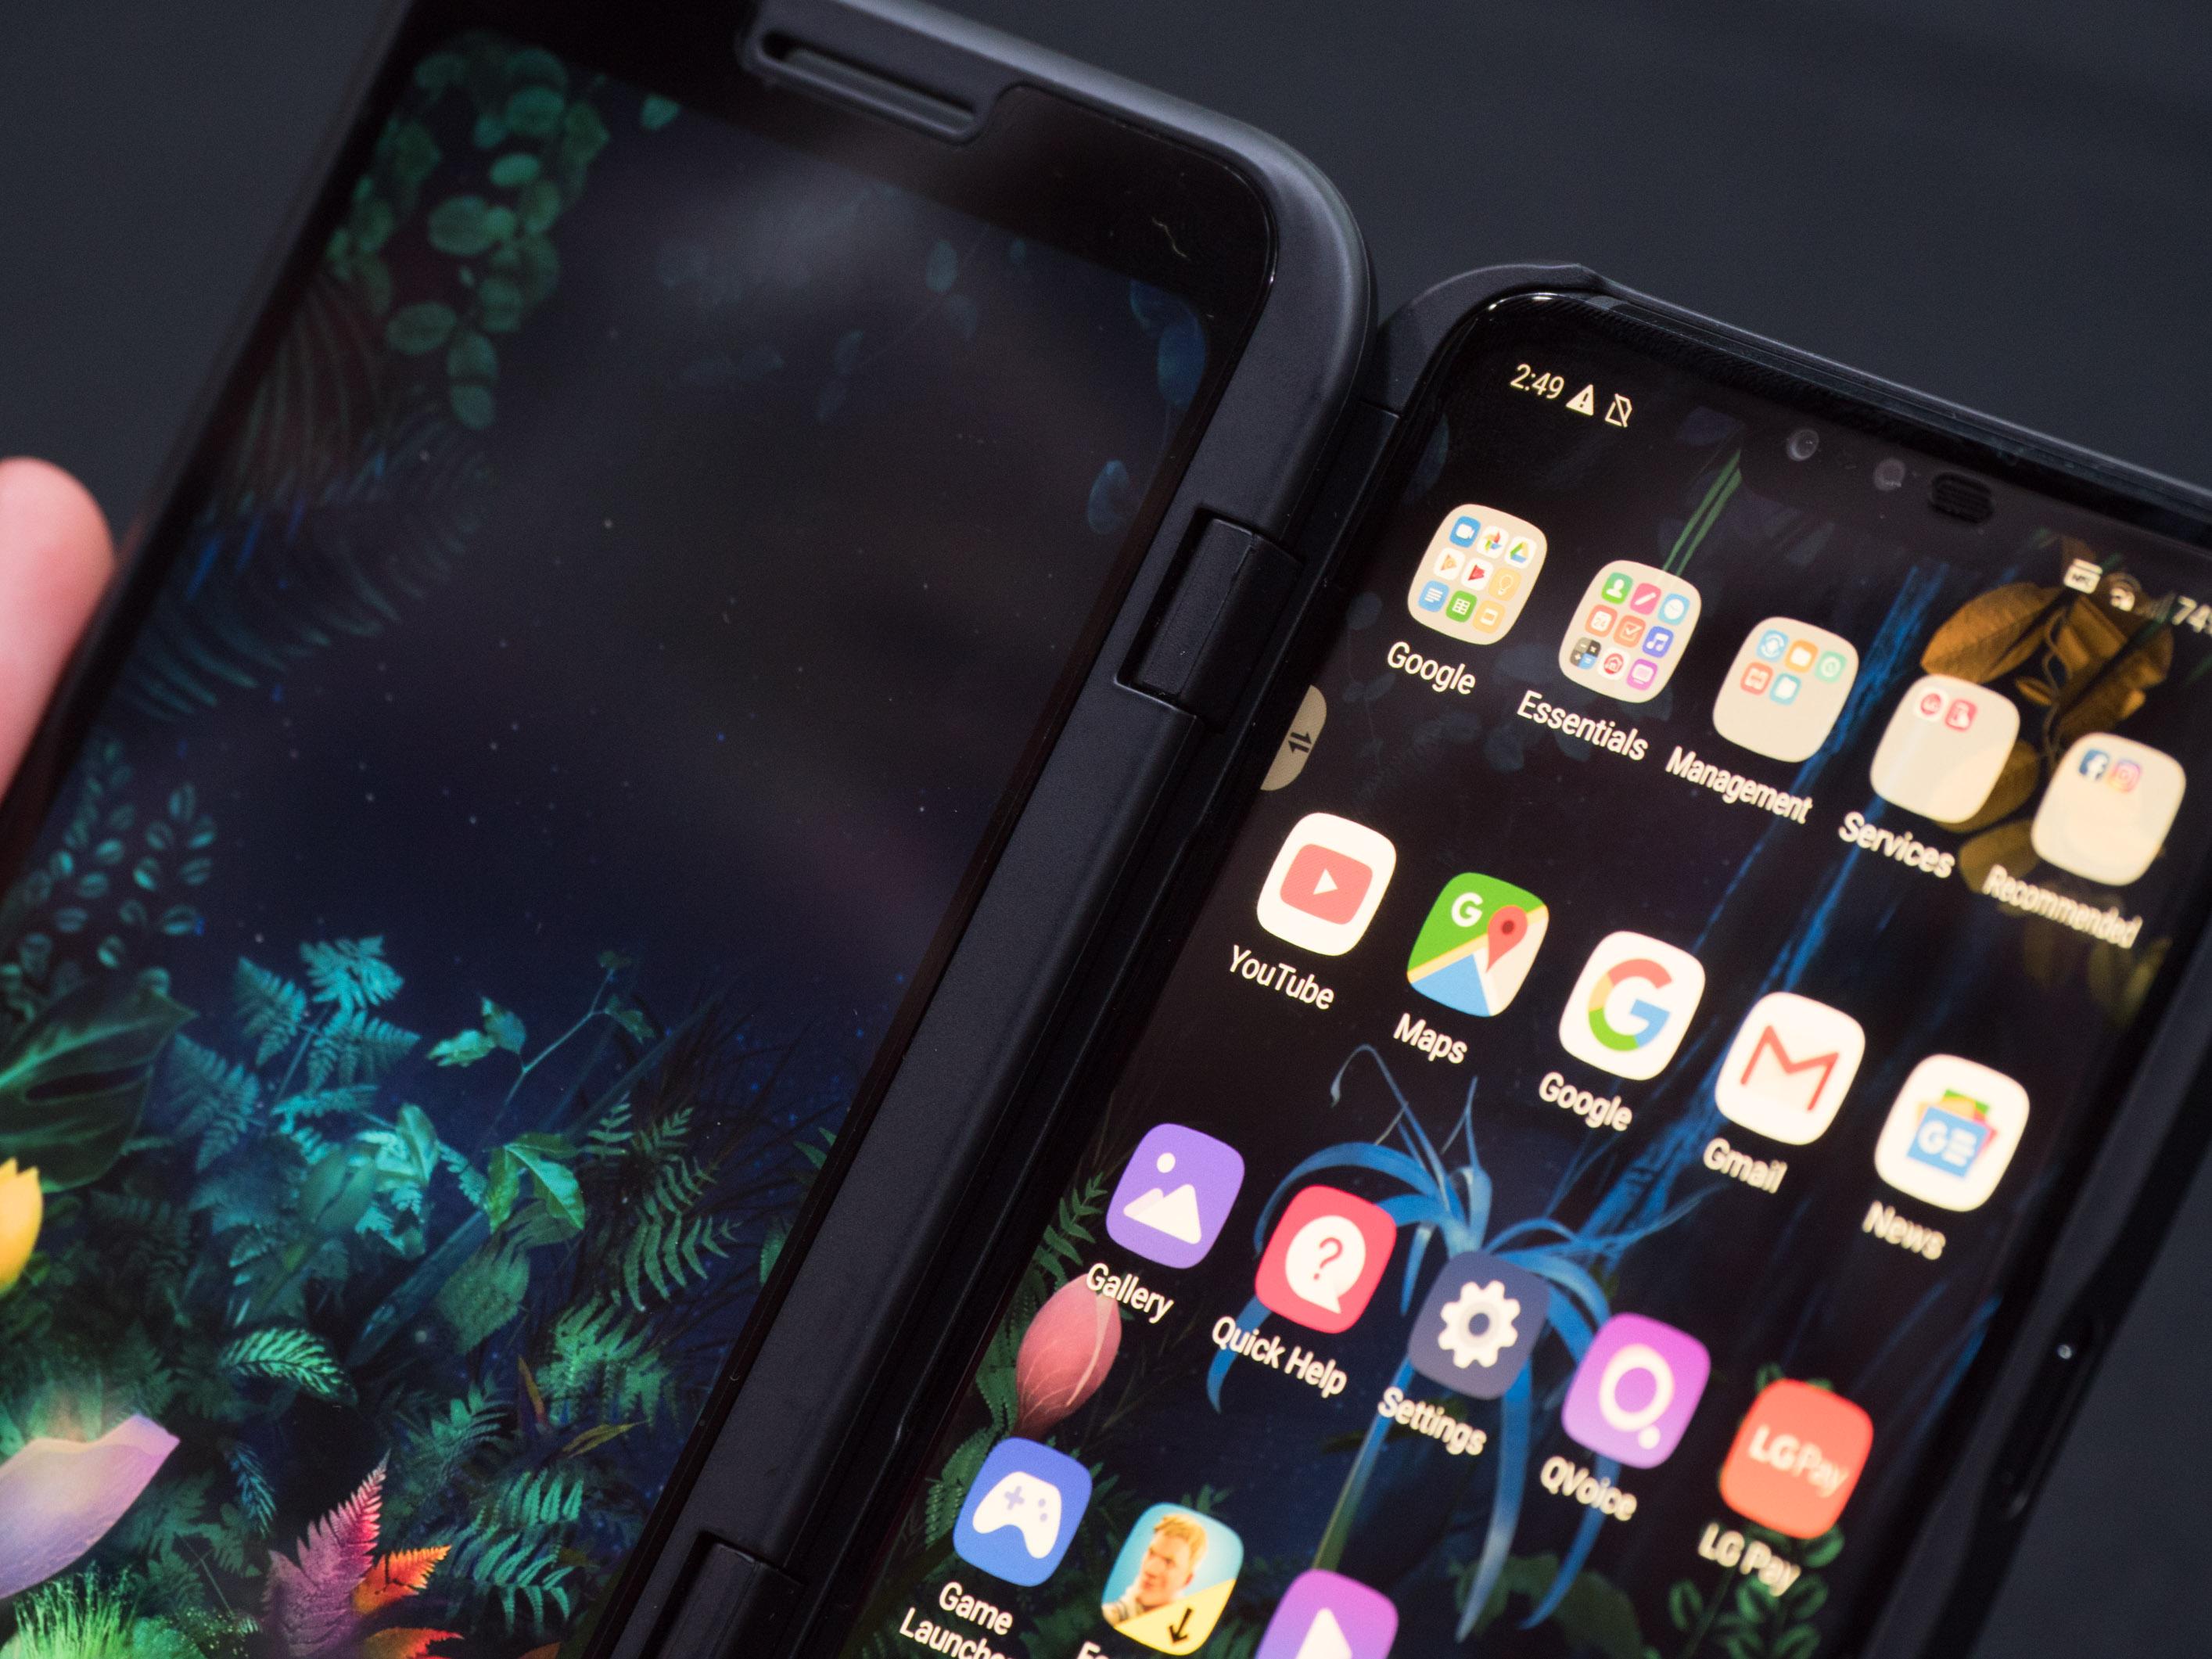 V50 Thinq Dual Screen im Hands on: LG zeigt Smartphone mit andockbarem Zusatzdisplay - LG V50 Thinq mit Dual Screen (Bild: Martin Wolf/Golem.de)